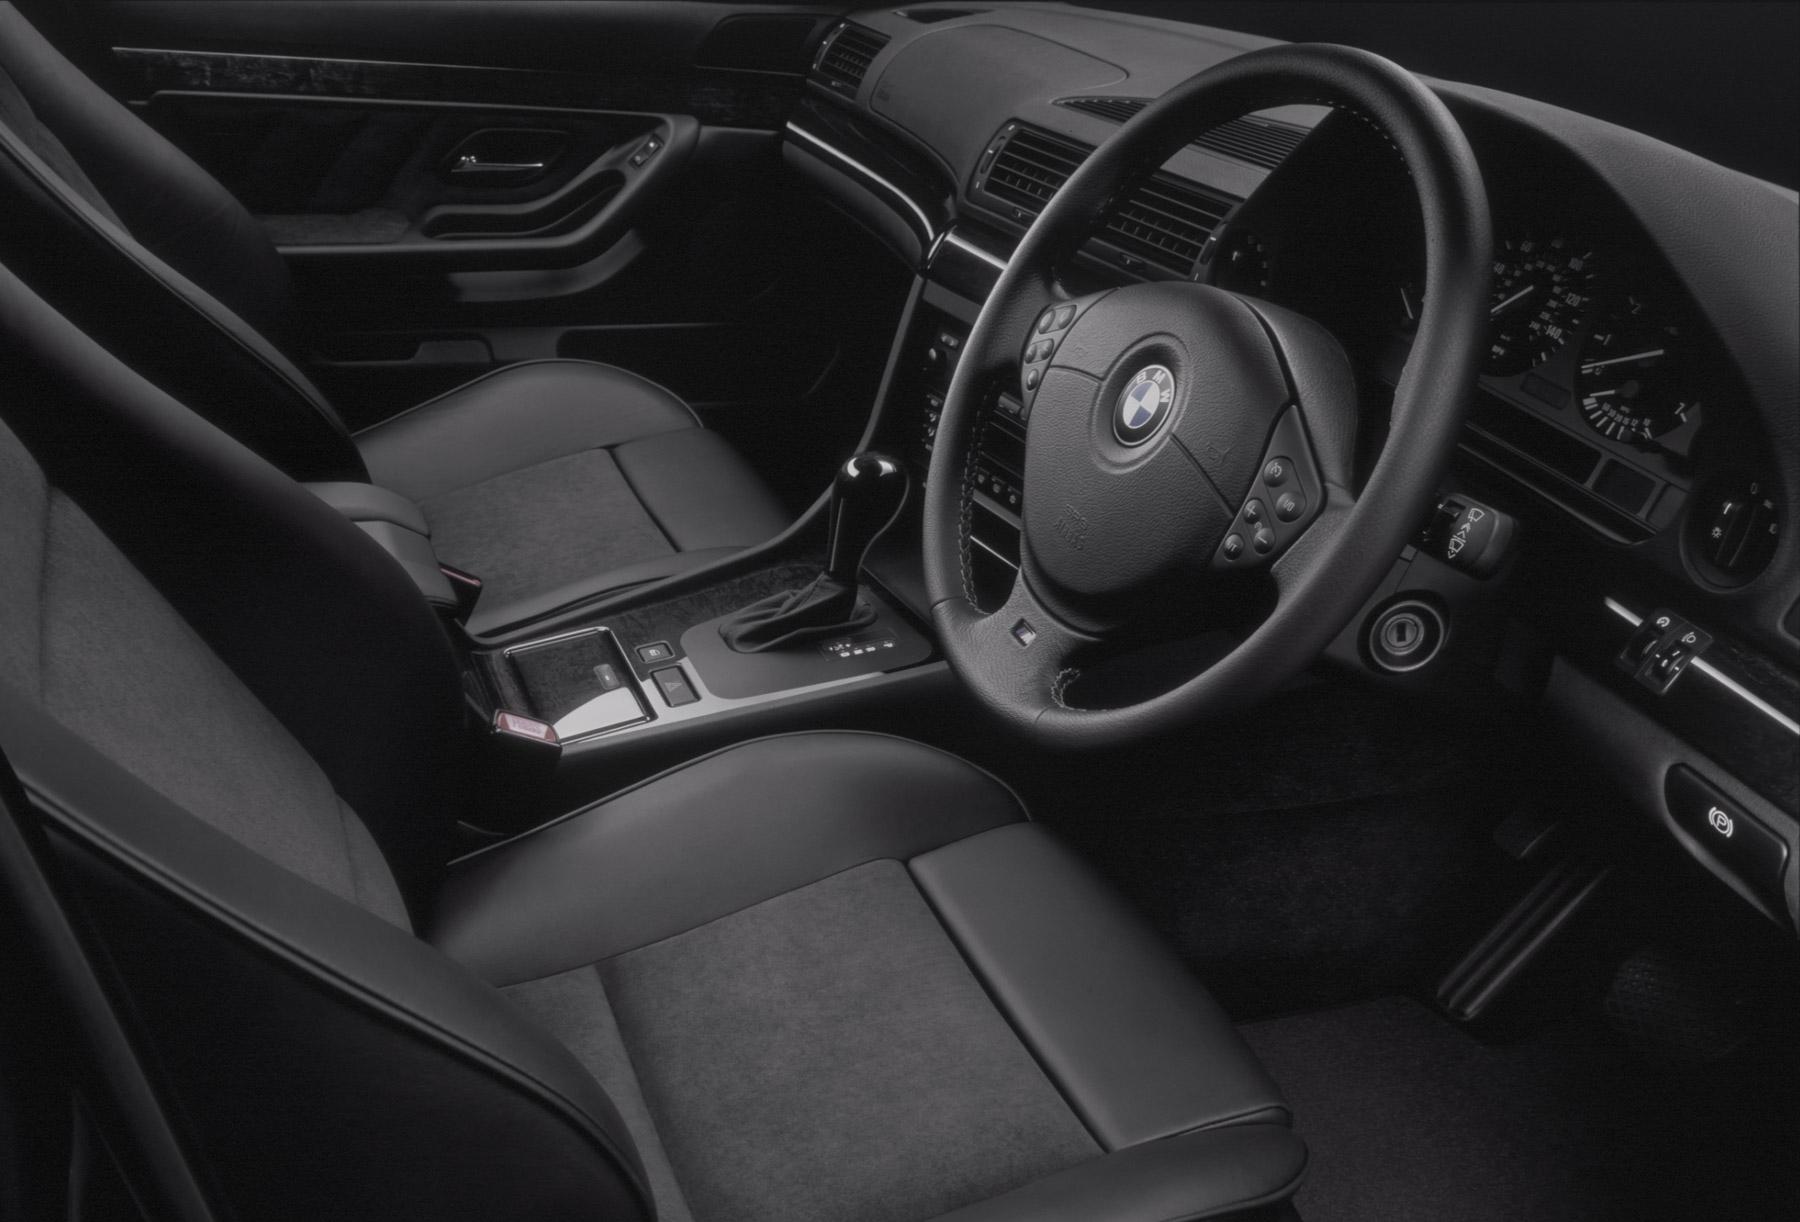 car photography 014 black leather interior. Black Bedroom Furniture Sets. Home Design Ideas